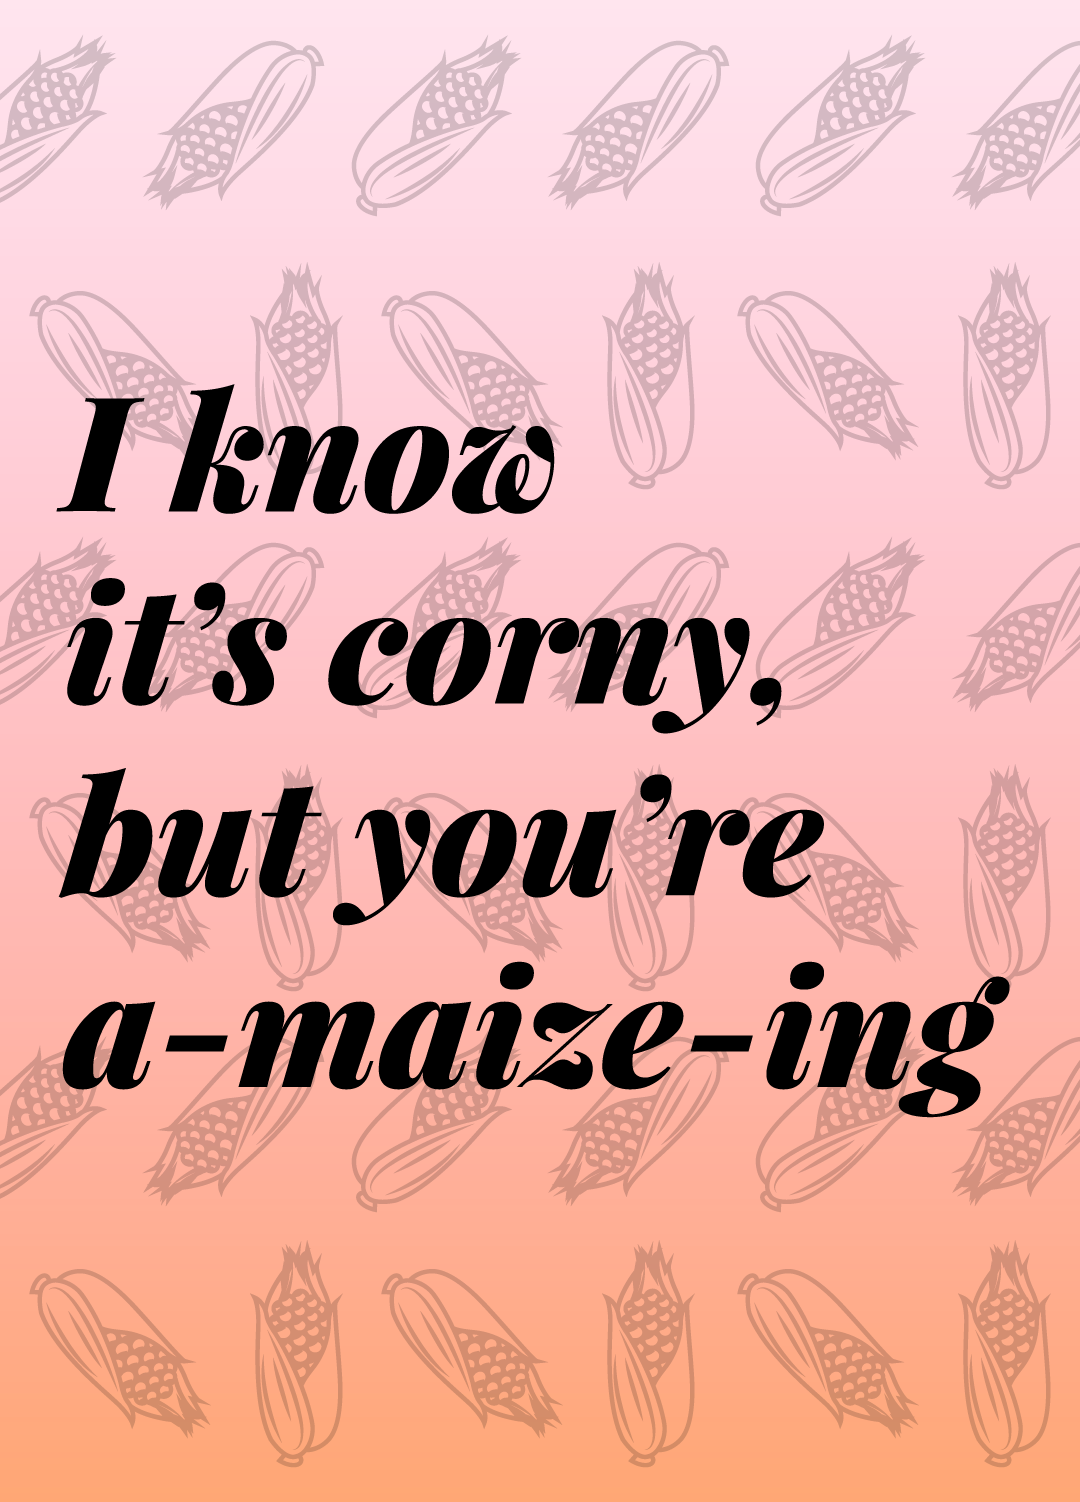 Corn Pun: I know it's corny, but you're a-maize-ing